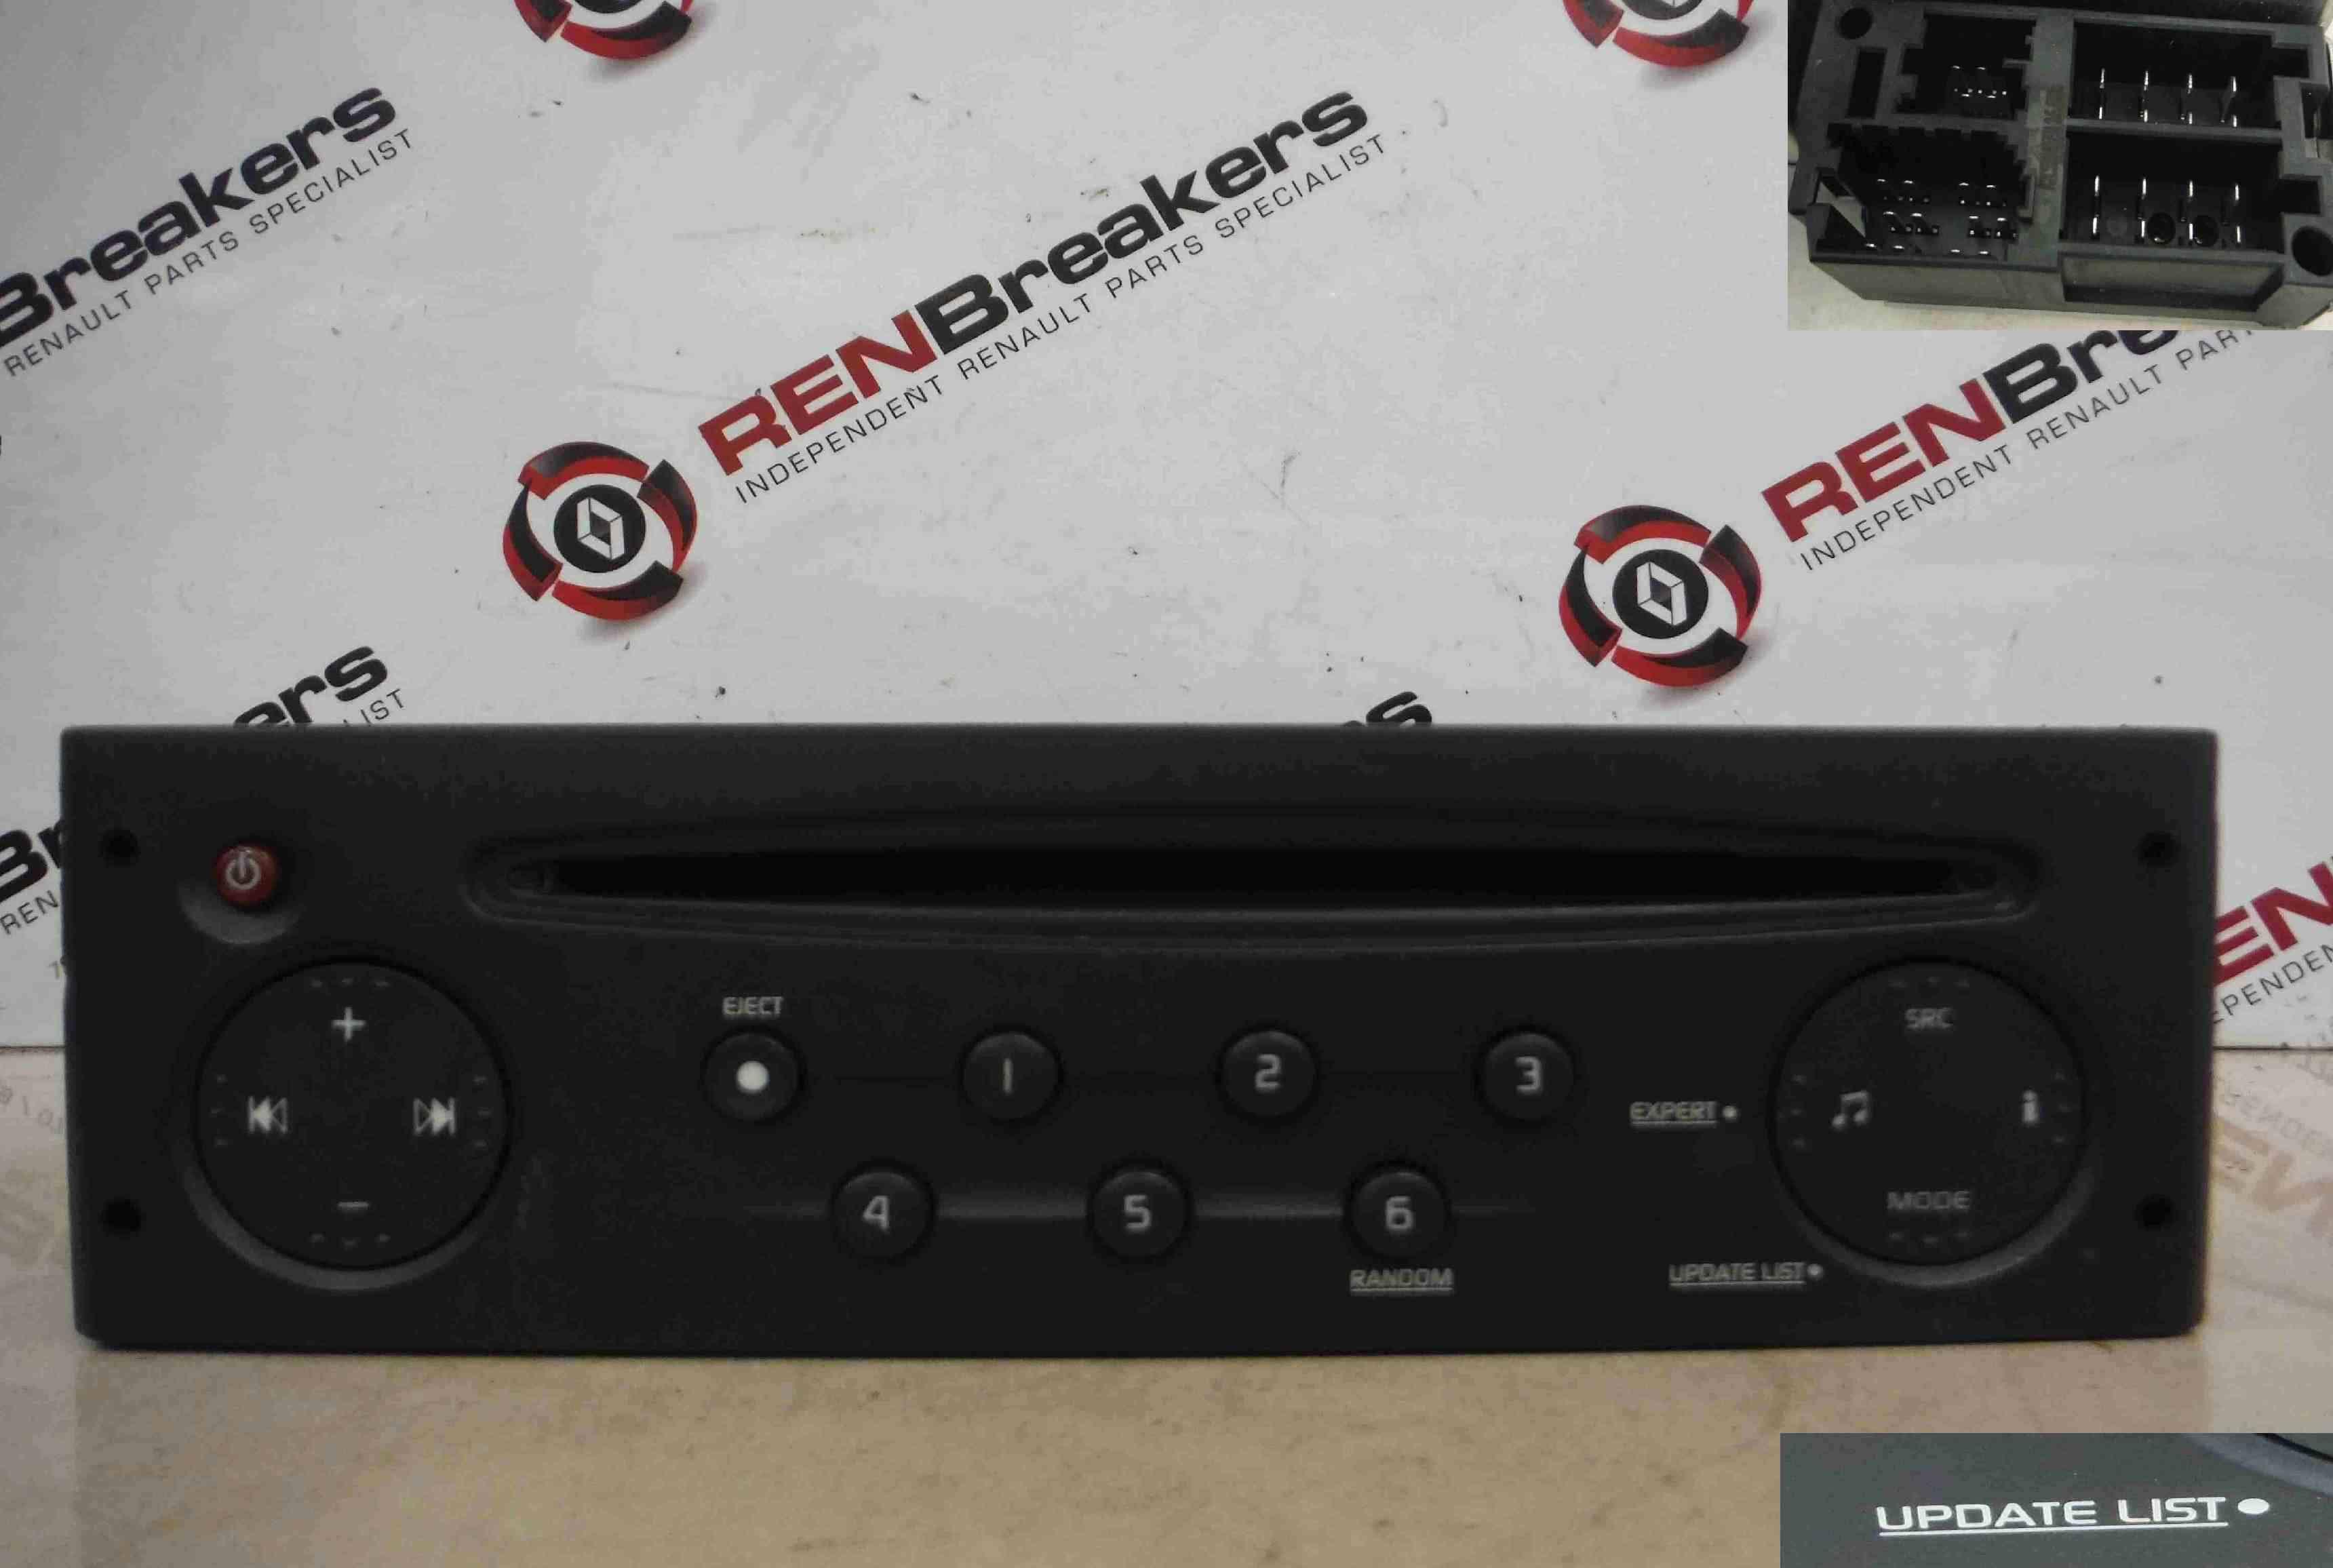 Renault Clio MK2 2001-2006 Radio CD Player Update List + Code 8200633621